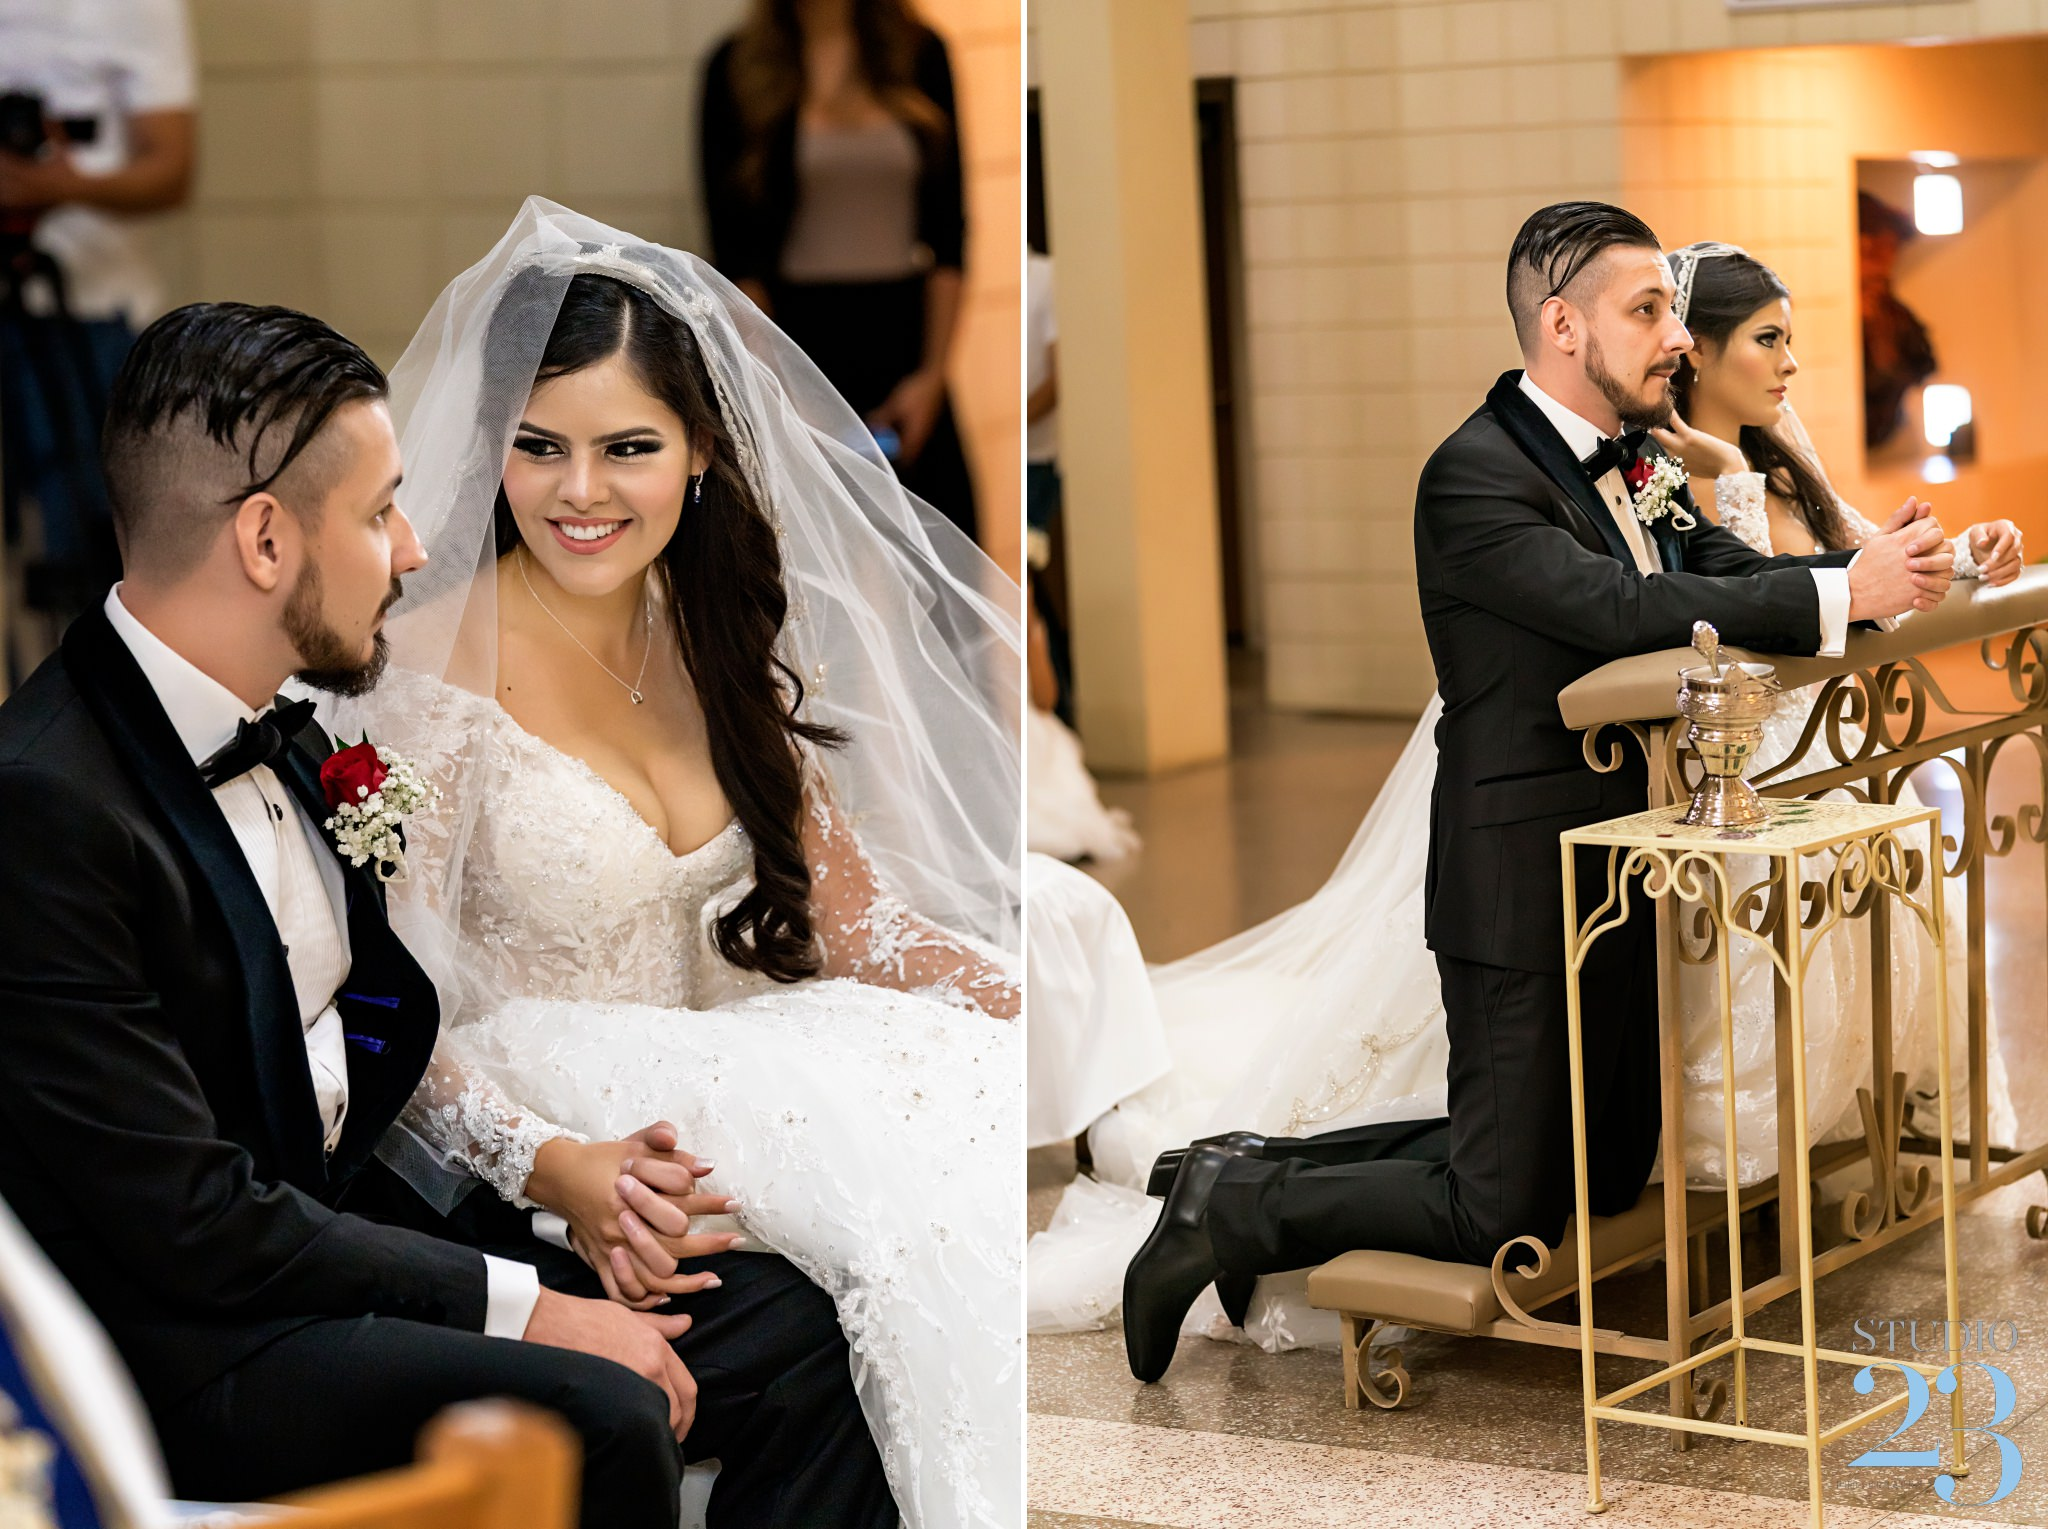 Renaissance Indian Wells Wedding | Elizabeth & Jose, Michael Anthony Photography Blog: Los Angeles Wedding Photography